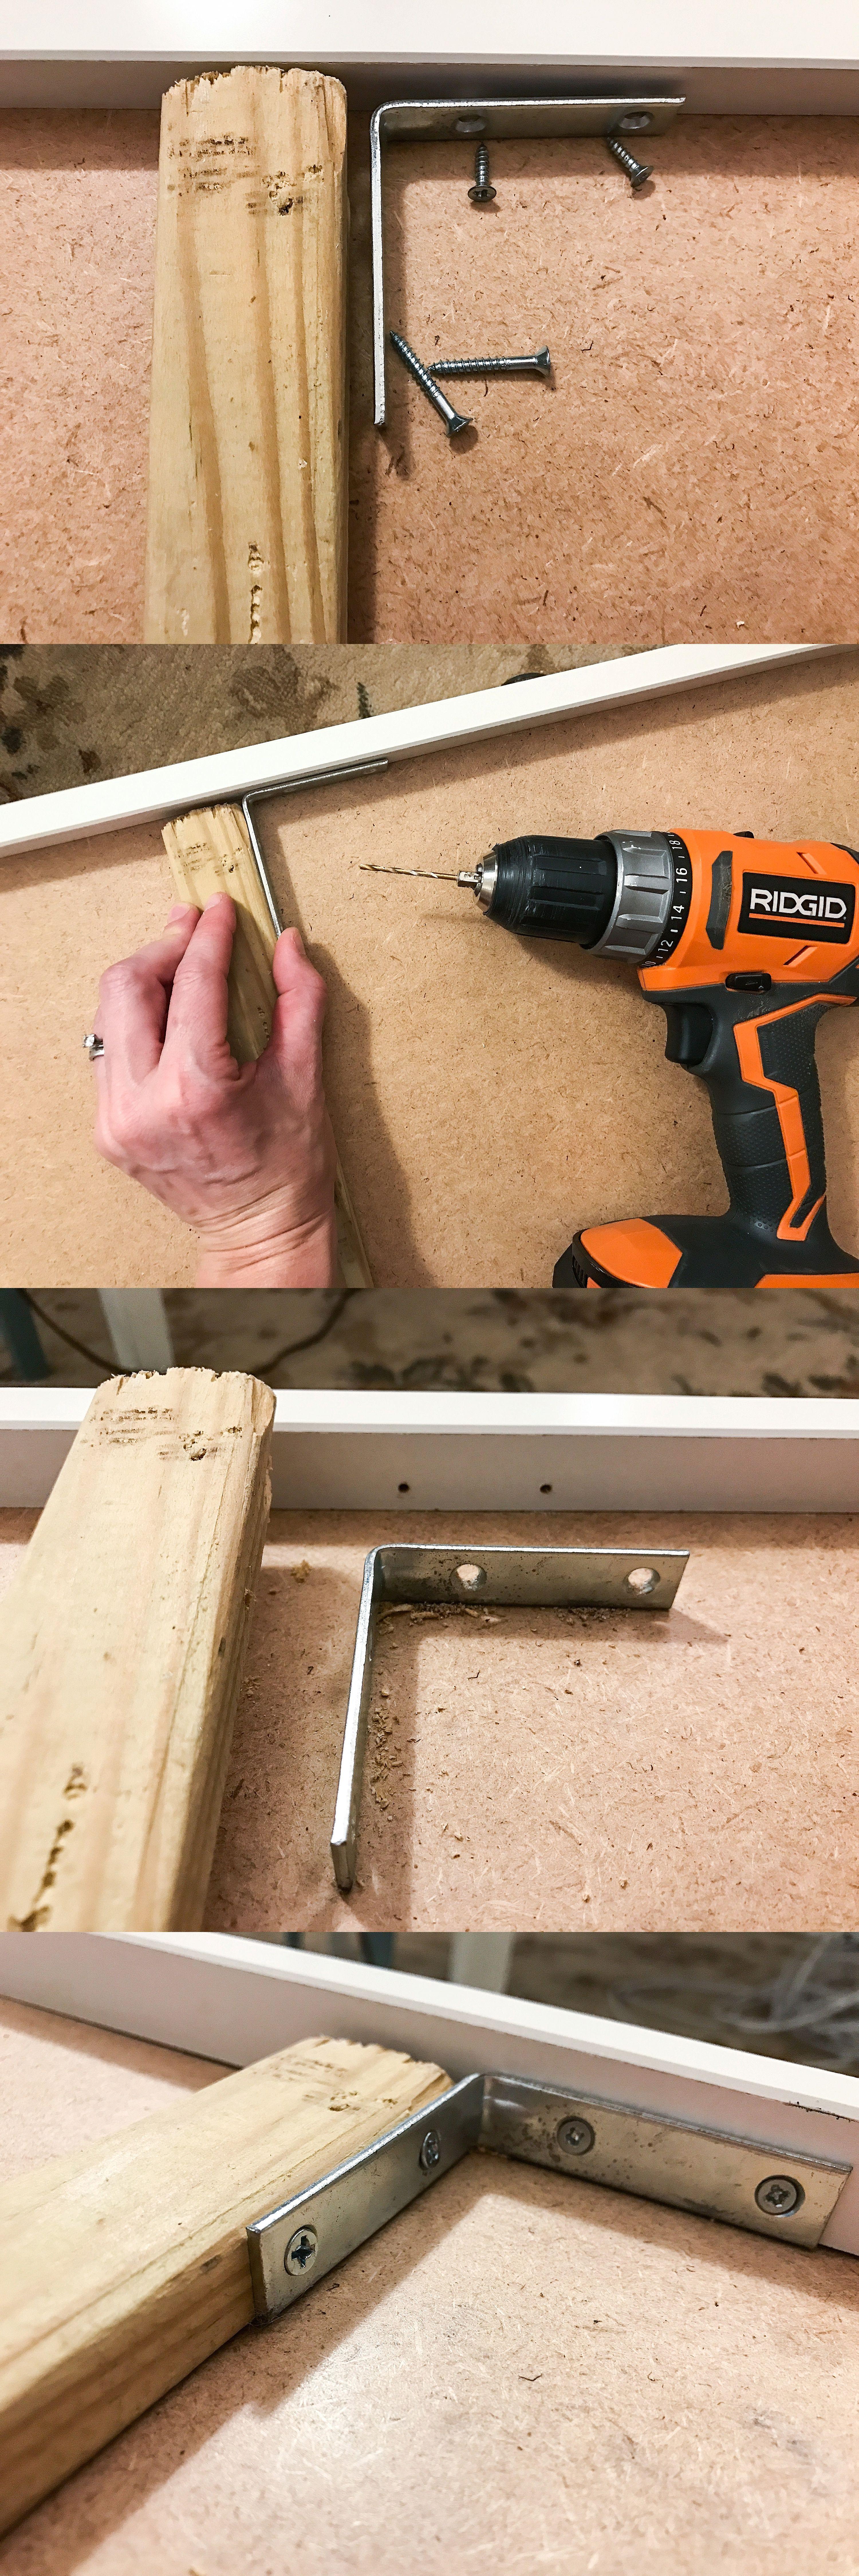 How To Fix Sagging Ikea Hemnes Dresser Drawers Video Ikea Hemnes Dresser Ikea Hemnes Hemnes Dresser